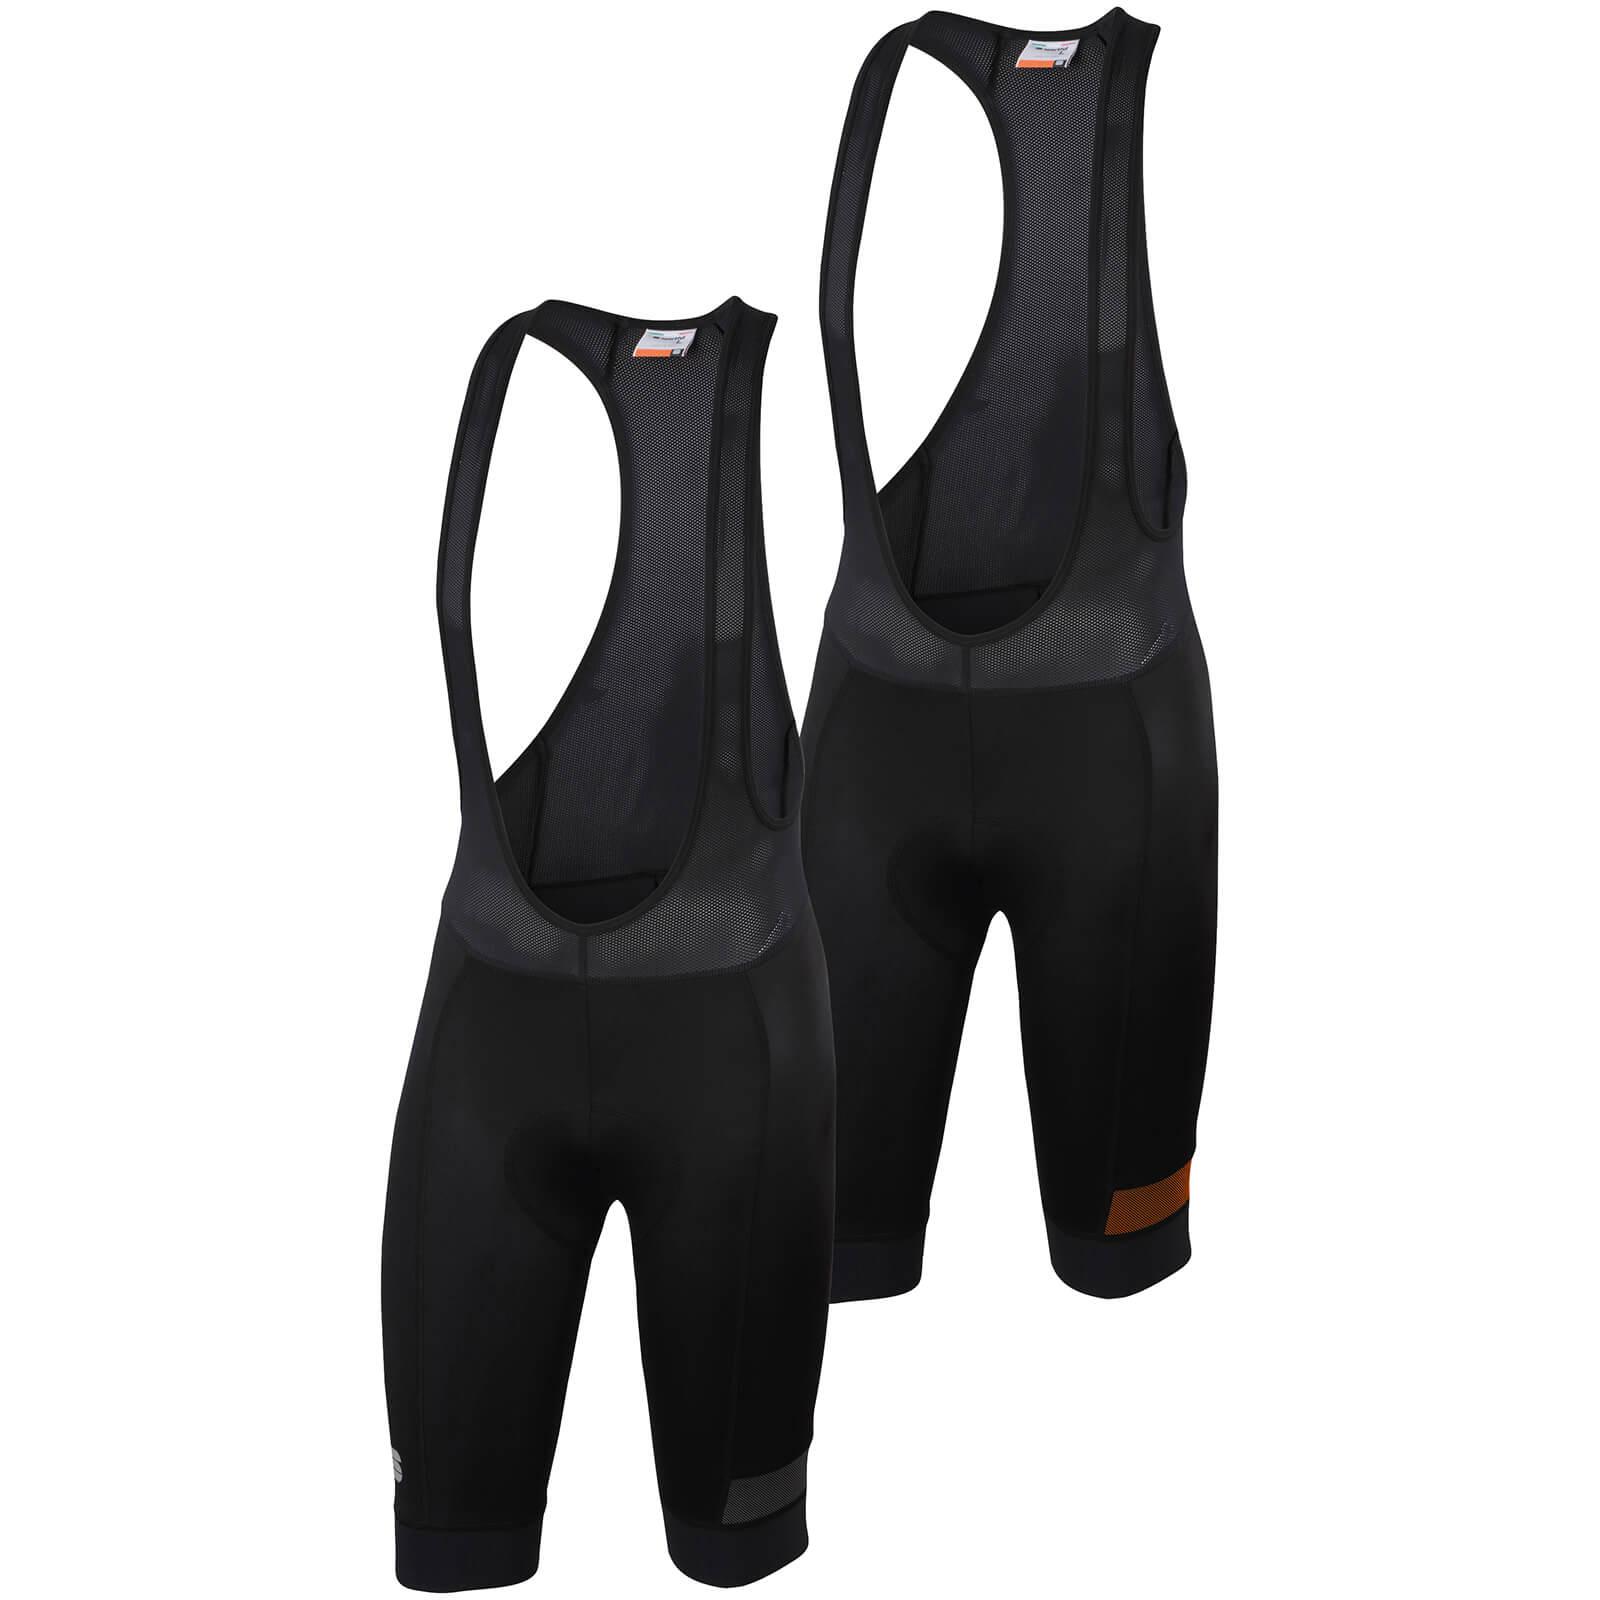 Sportful Giara Bib Shorts - XXL - Black